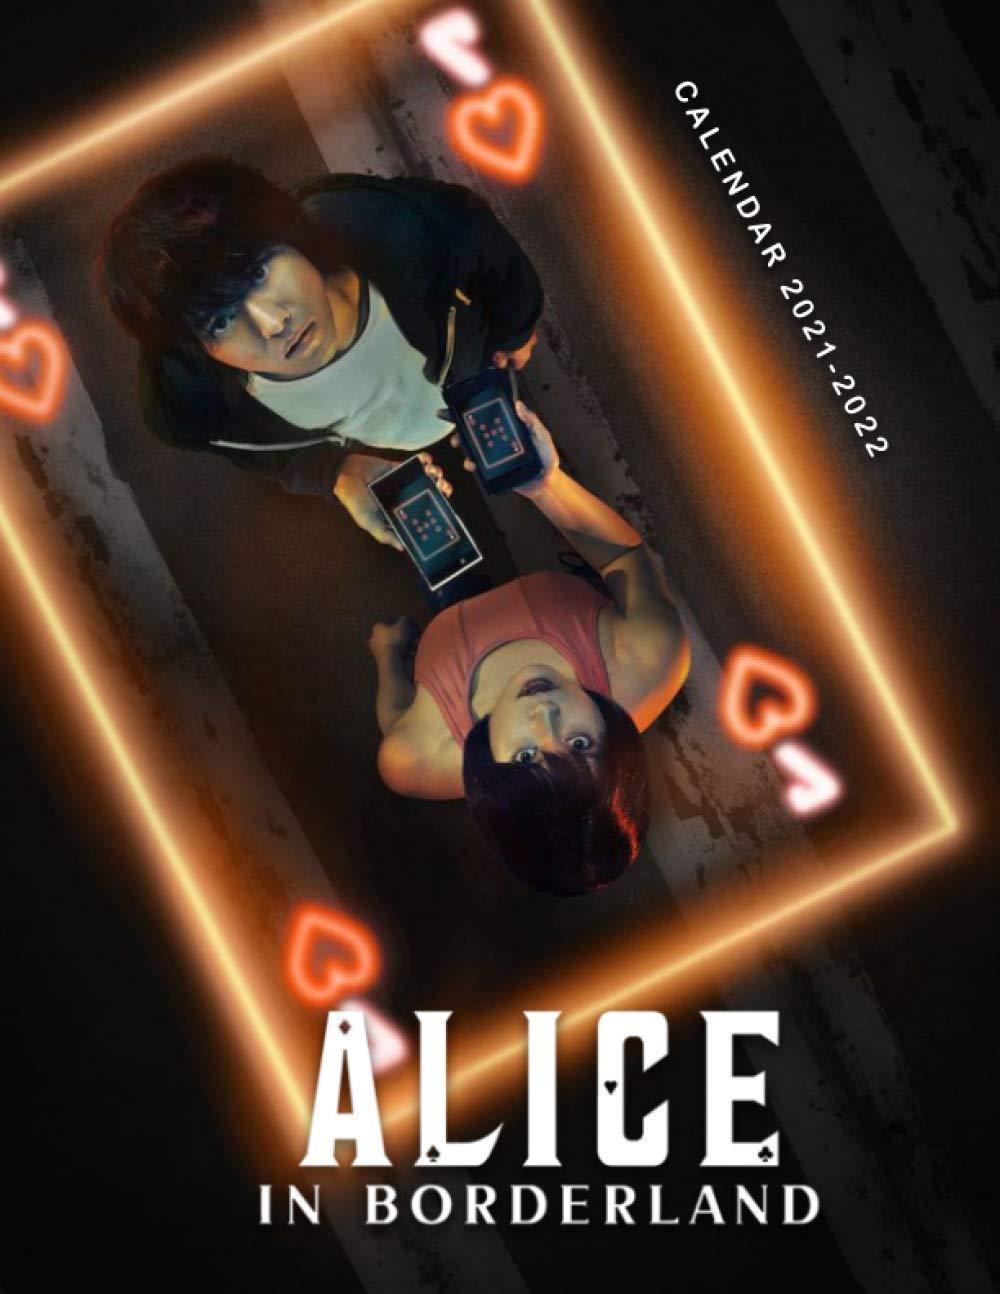 Amazon.com: Alice in Borderland Calendar 2021-2022: Special Calendar & Planner for Fans (2 Years Calendar) (9798597907574): Publishing, Arc: Books